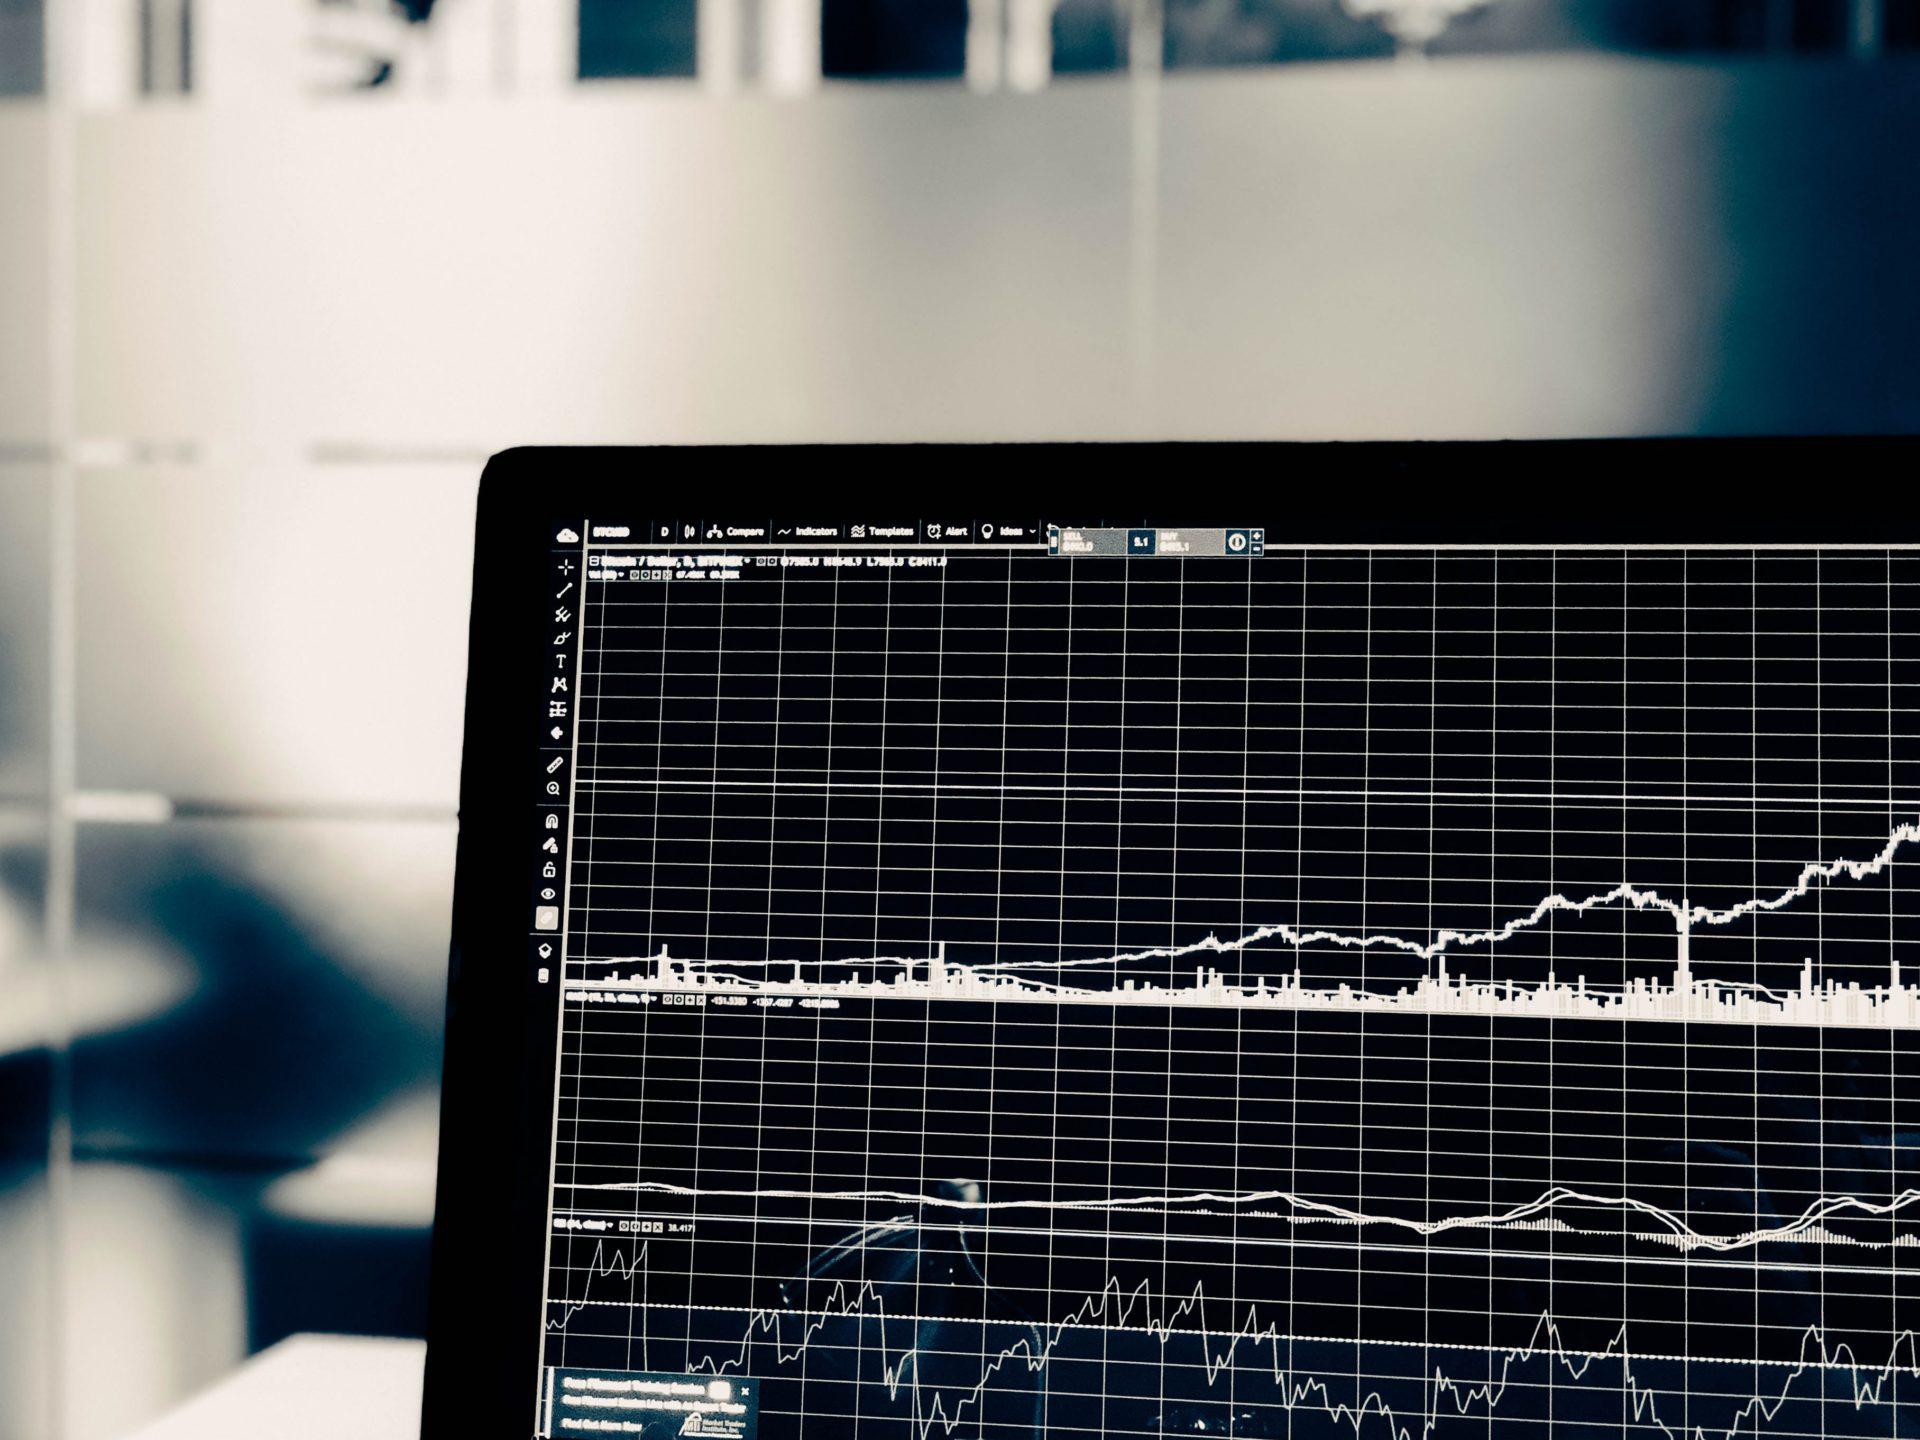 Circle-Backed Poloniex Drops U.S. Crypto Margin Trading, Delists 3 Altcoins 13